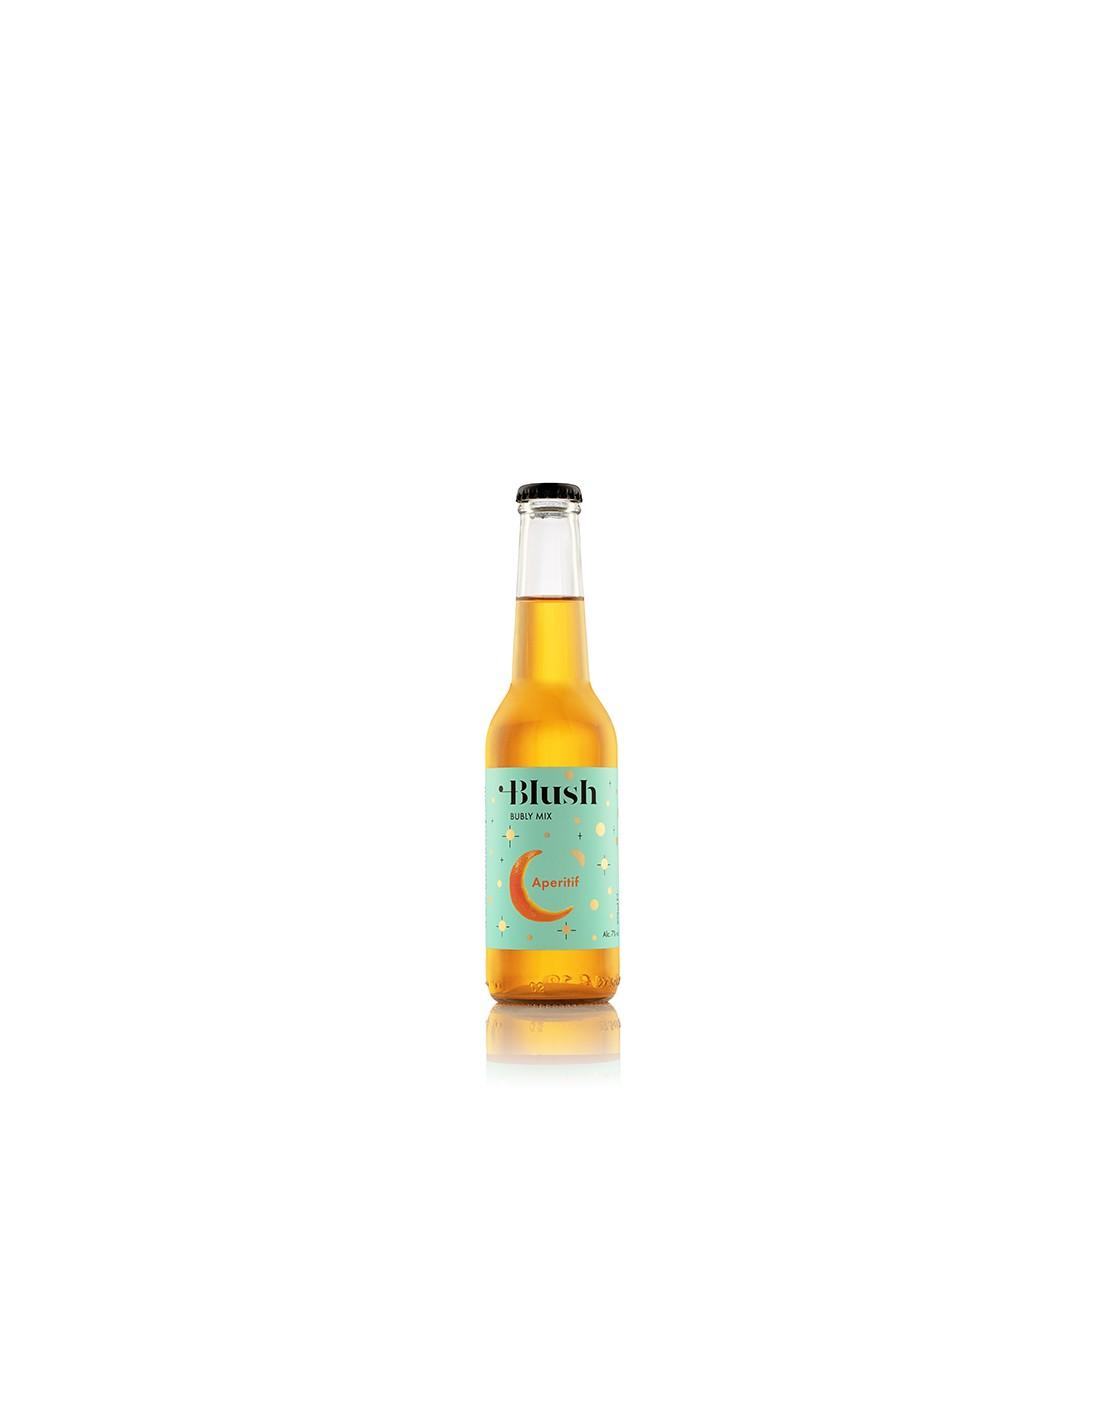 Cocktail portocaliu demidulce, Blush Aperitif, Ciumbrud, 7% alc., 0.275L, Romania